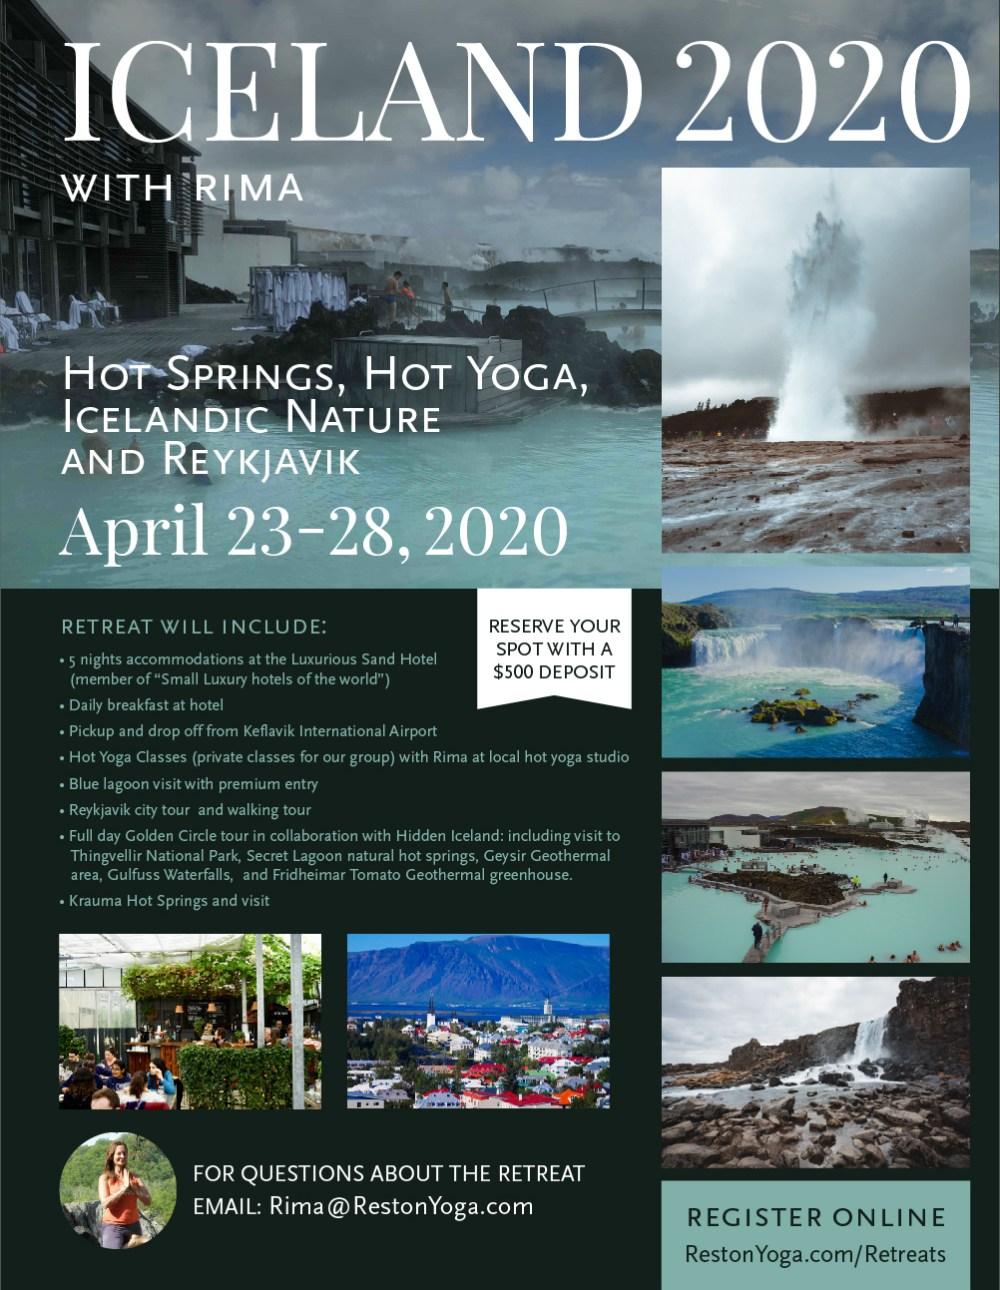 ICELAND April 2020: Hot Springs, Hot Yoga, Icelandic Nature and Reykjavik